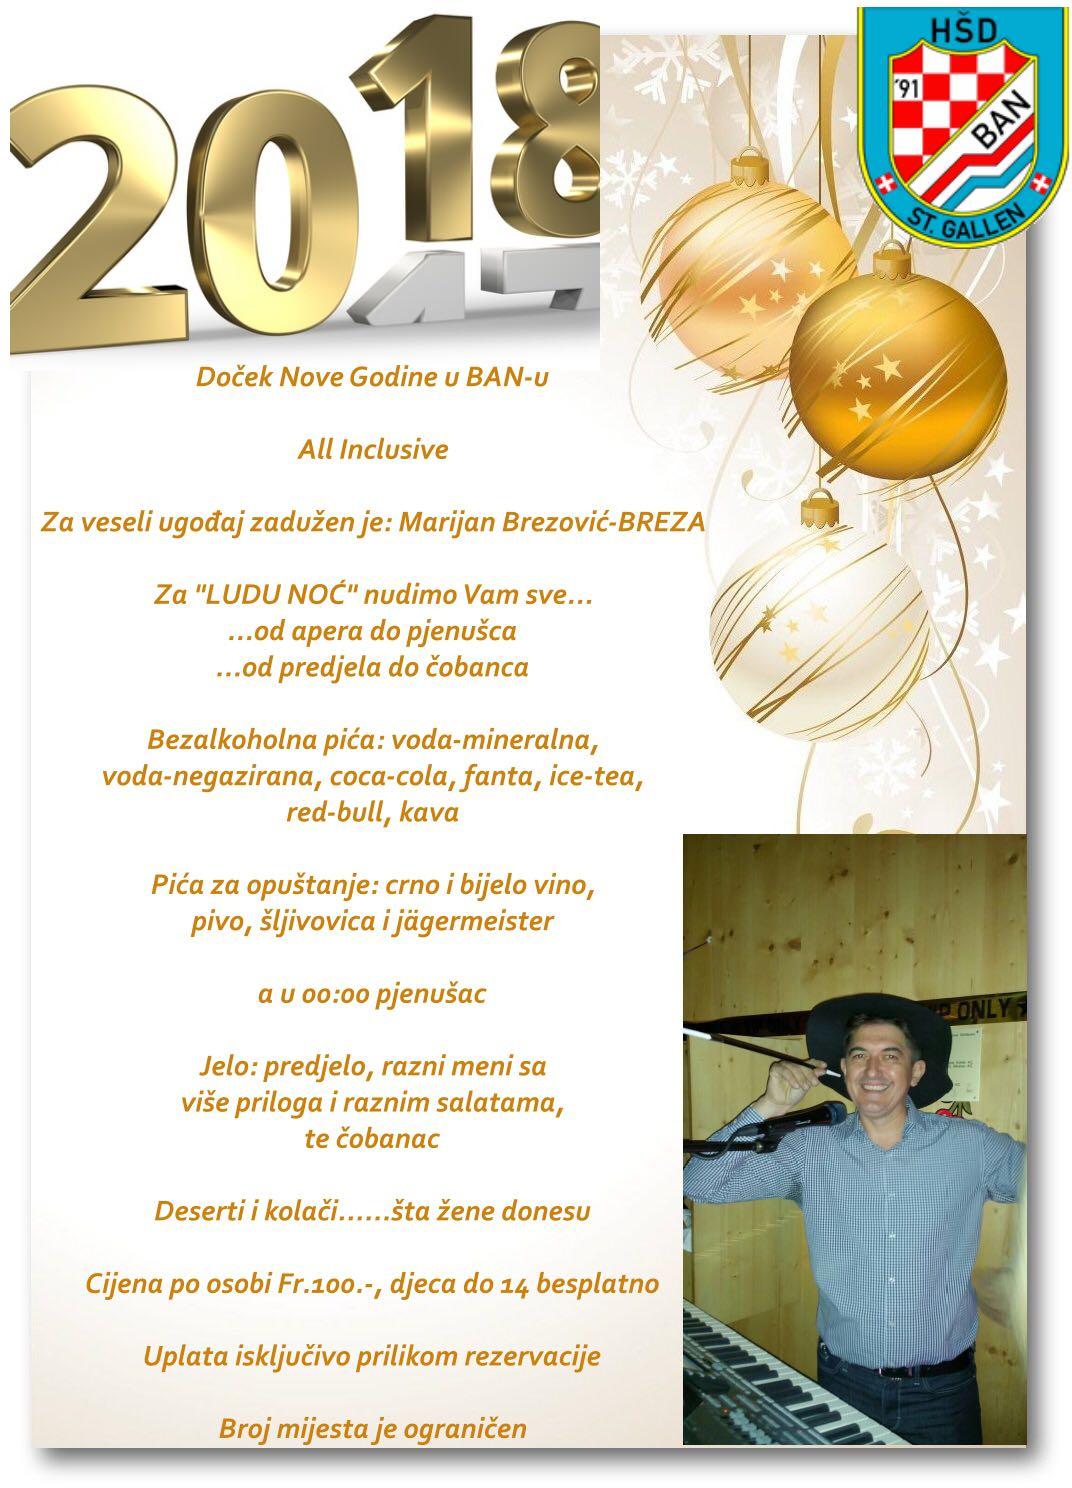 Doček Nove Godine u BAN-u @ Restaurant Kreuz-Winkeln | St. Gallen | Sankt Gallen | Switzerland